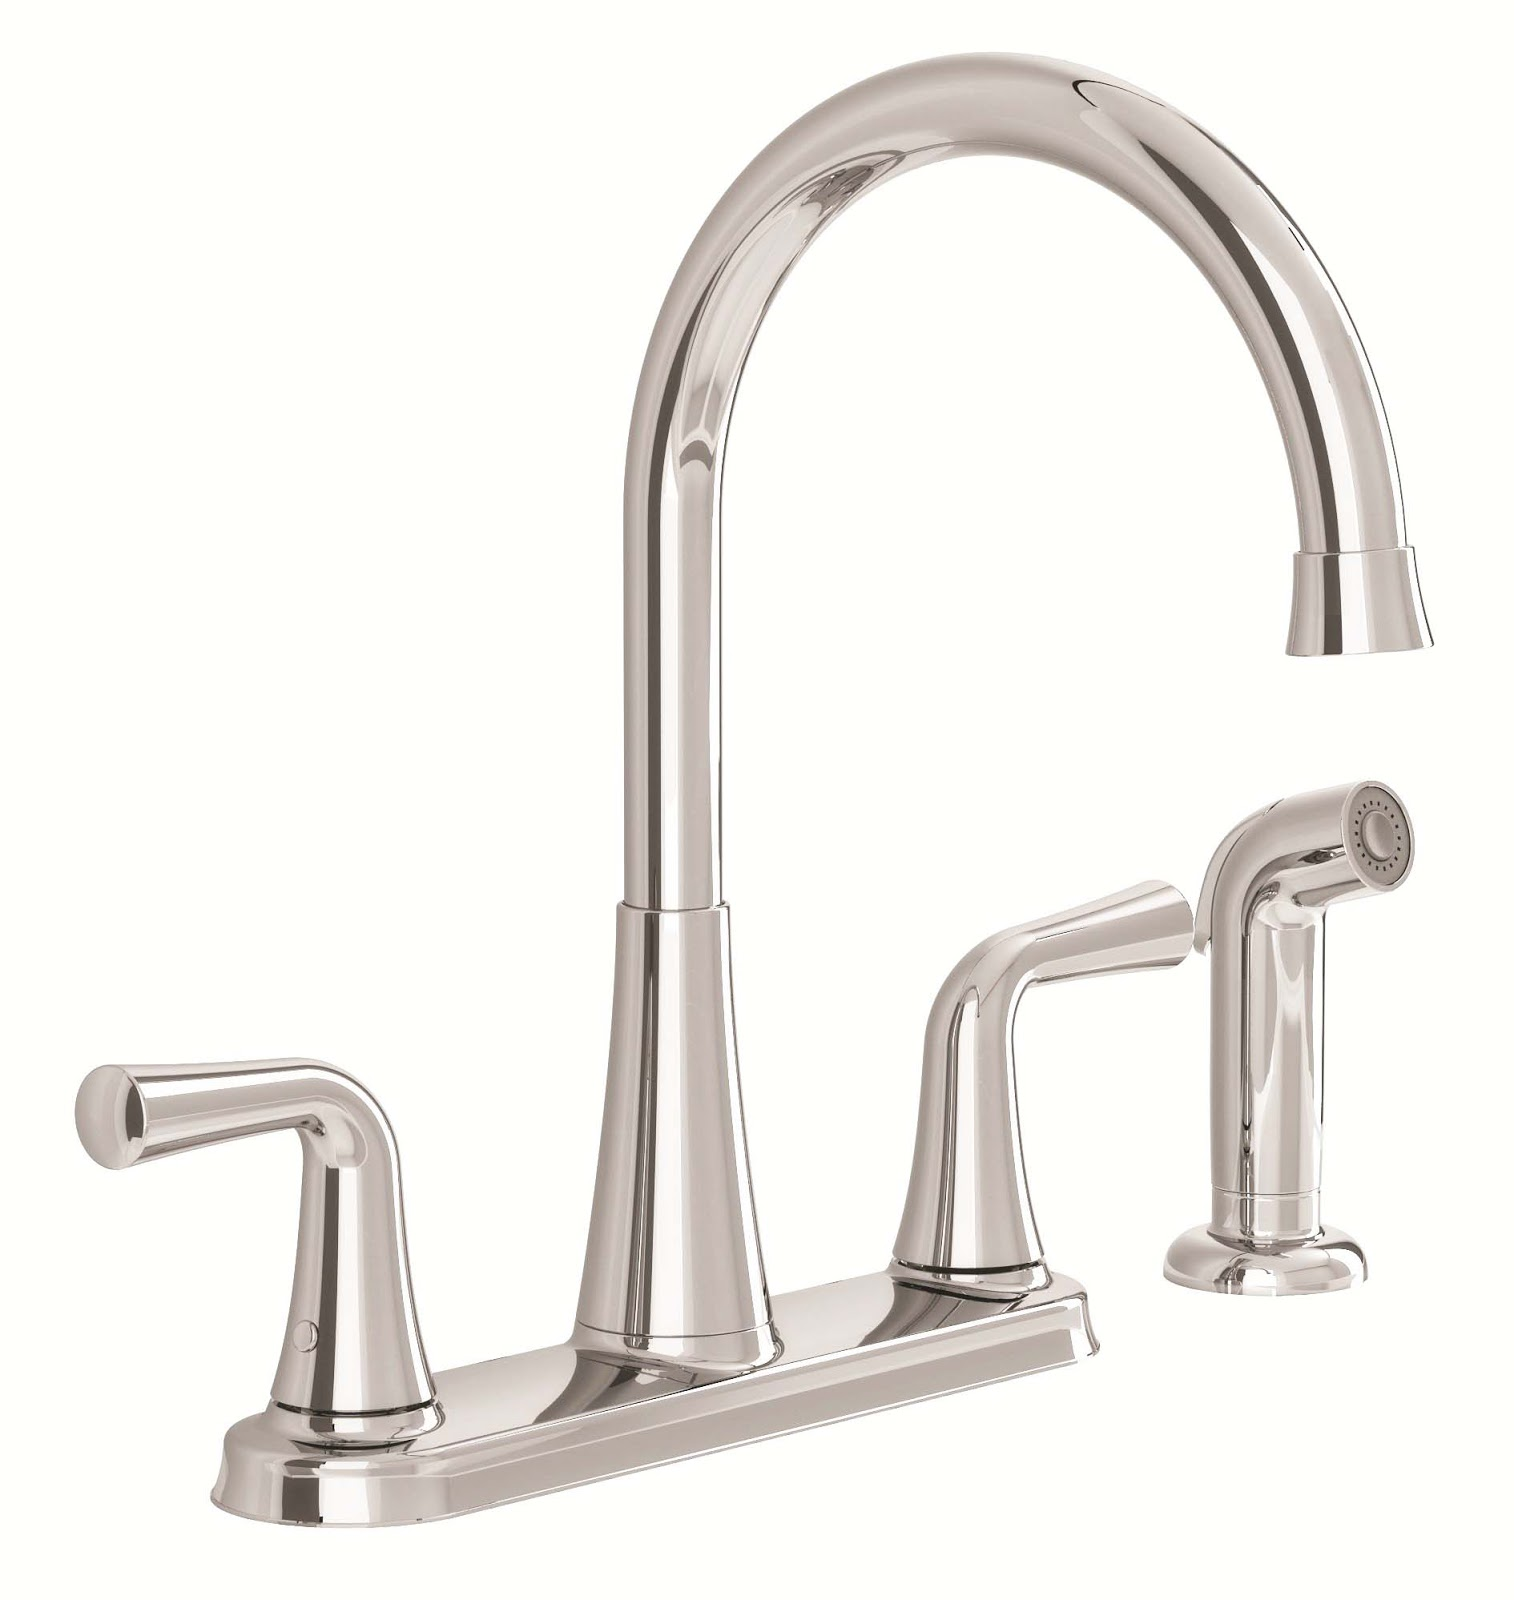 Kitchen Sink Faucet Parts Asmallnation